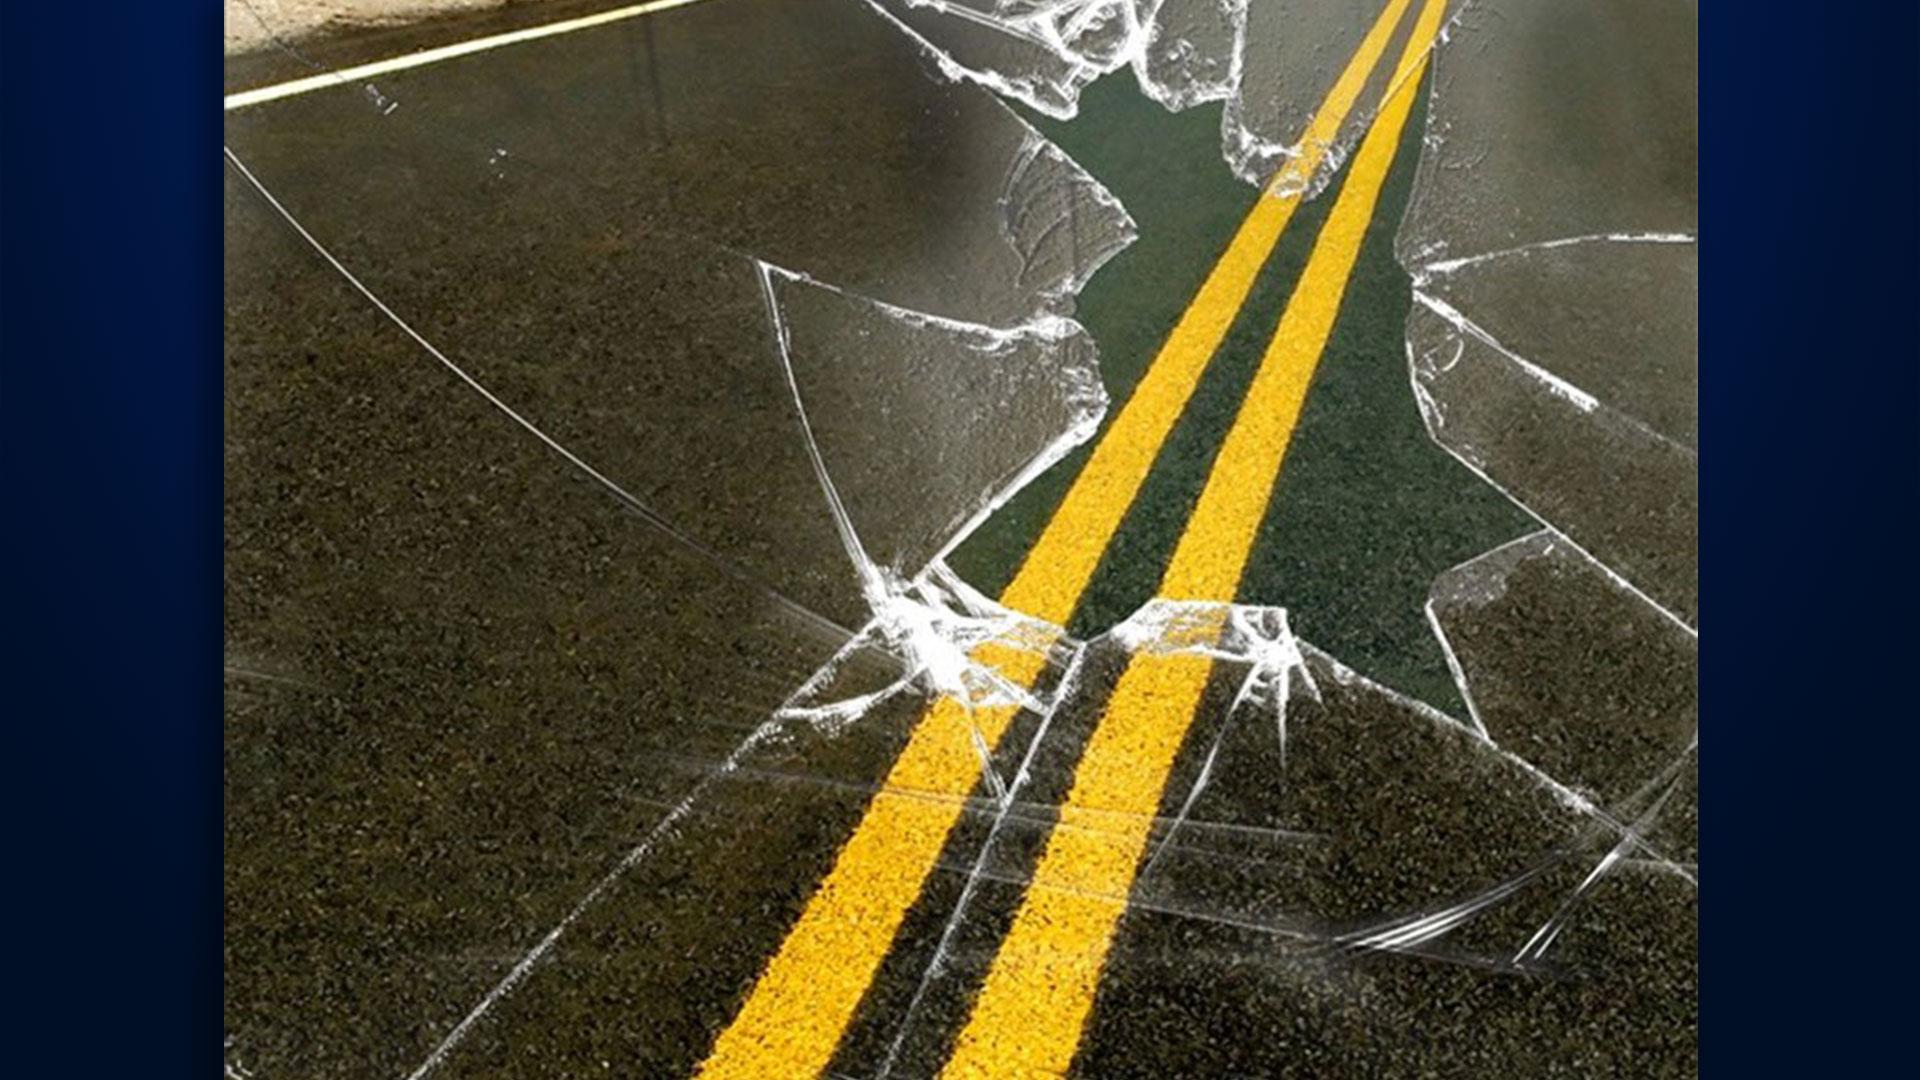 KELO Crash Broken Glass.jpg